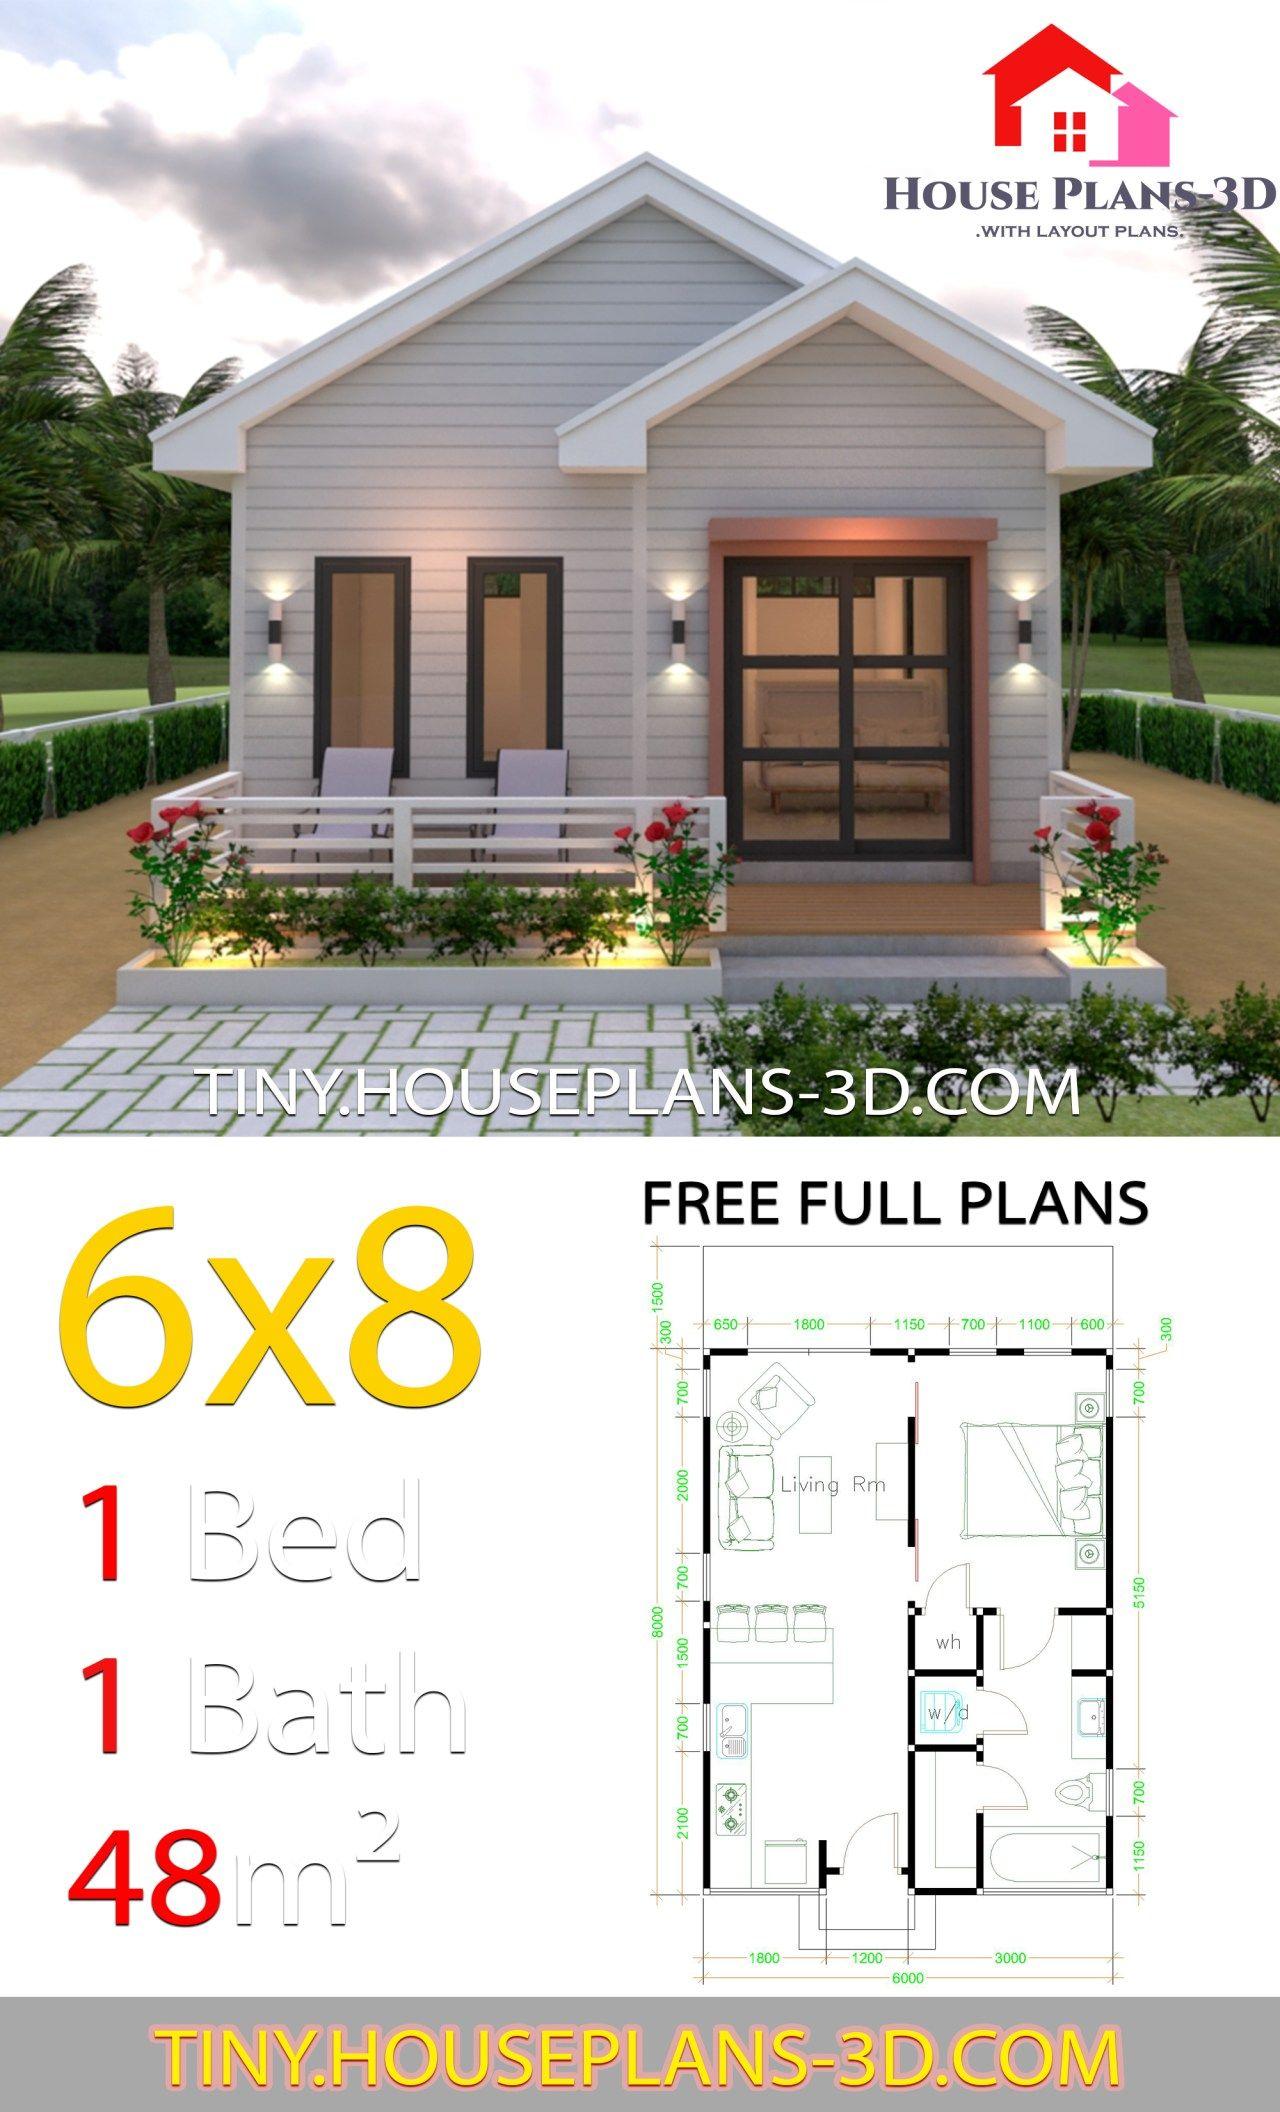 Studio House Plans 6x8 Gable Roof Tiny House Plans Simple House Plans Tiny House Plans Tiny House Floor Plans